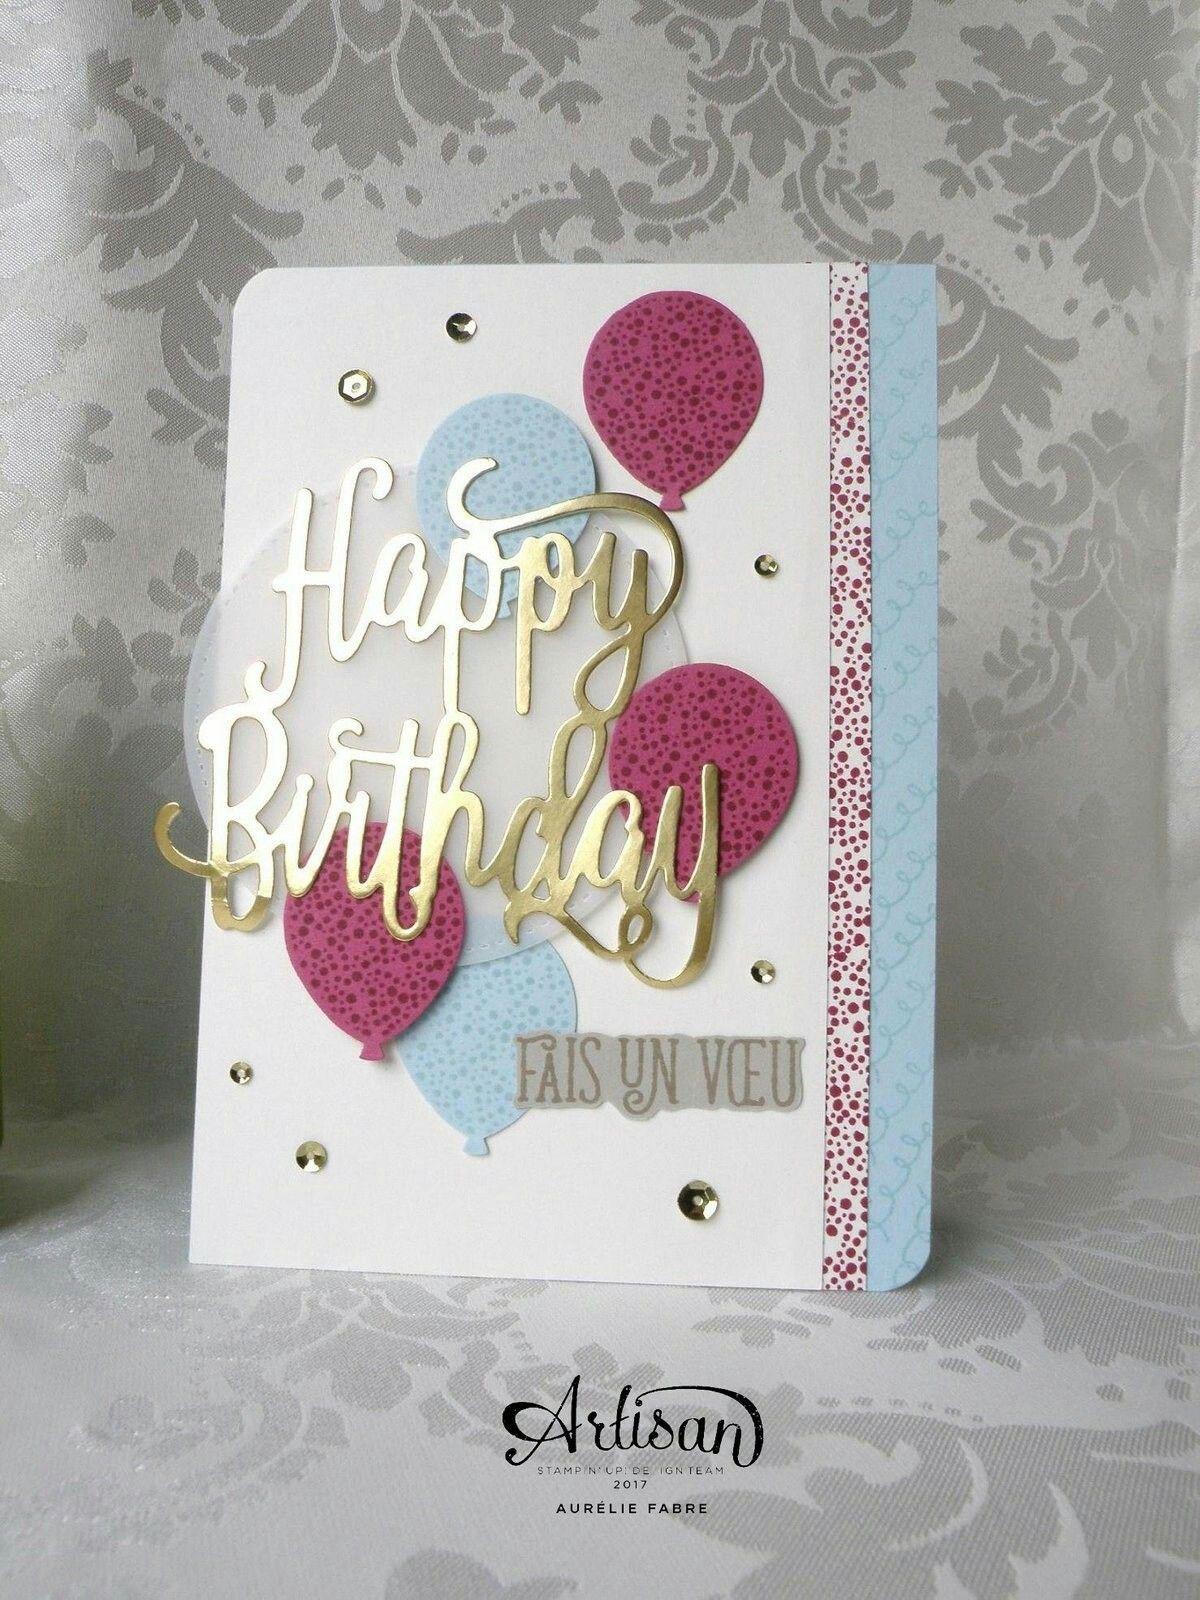 Pin By Chris Plehn On Card 21 Pinterest Cards Happy Birthday